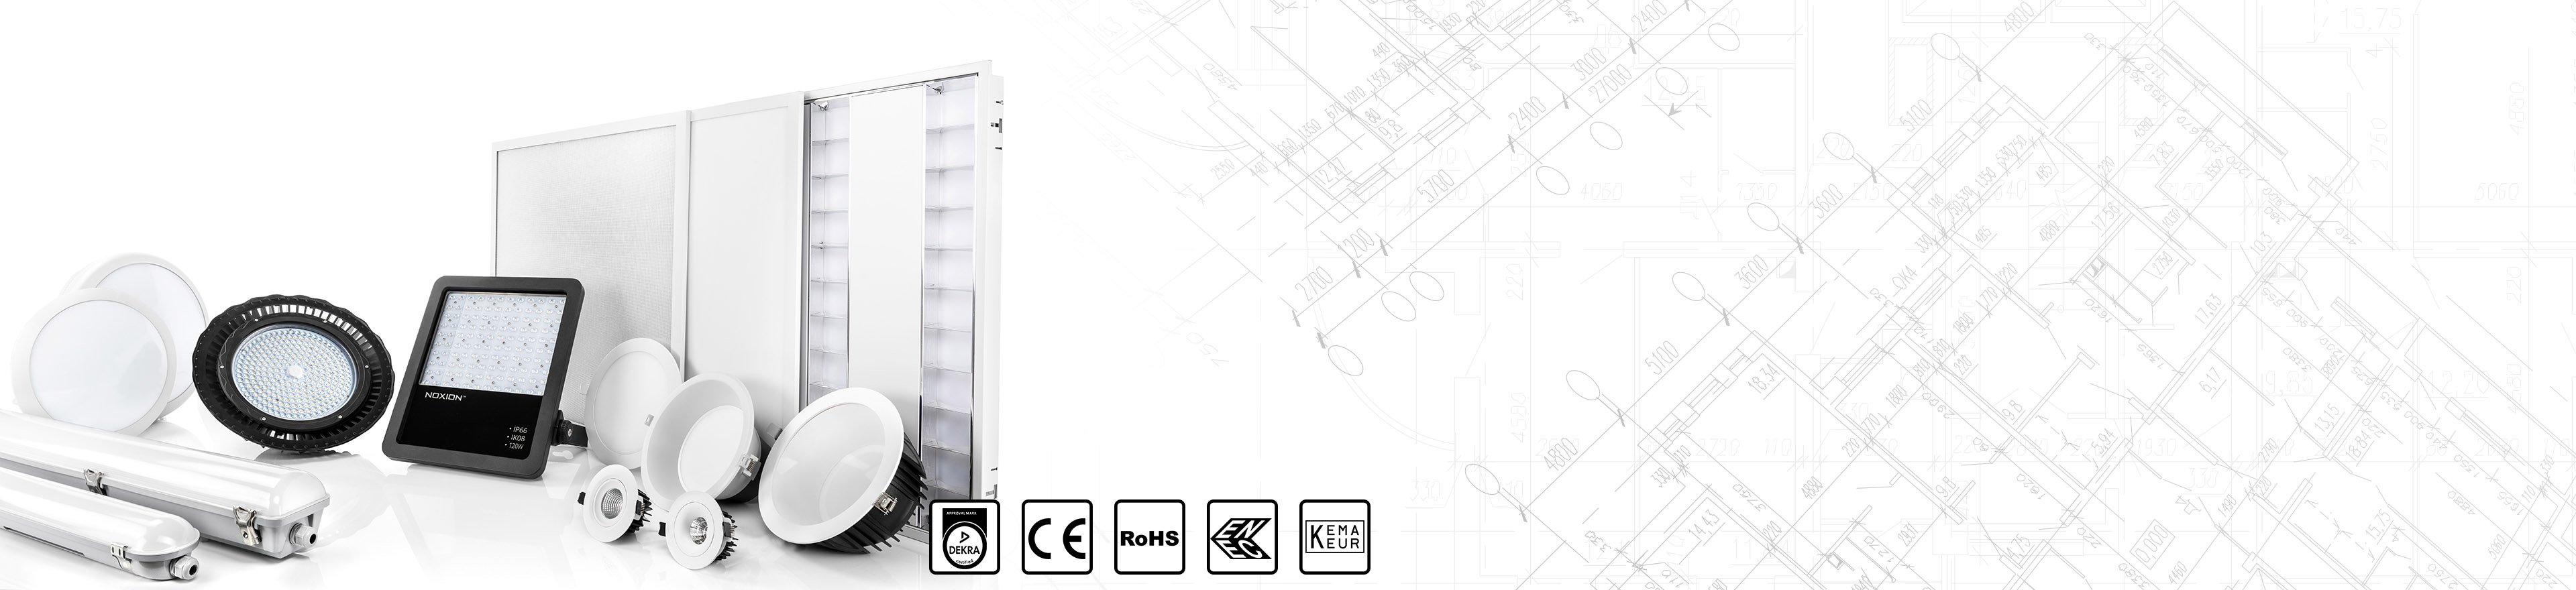 Compleet Premium LED-assortiment